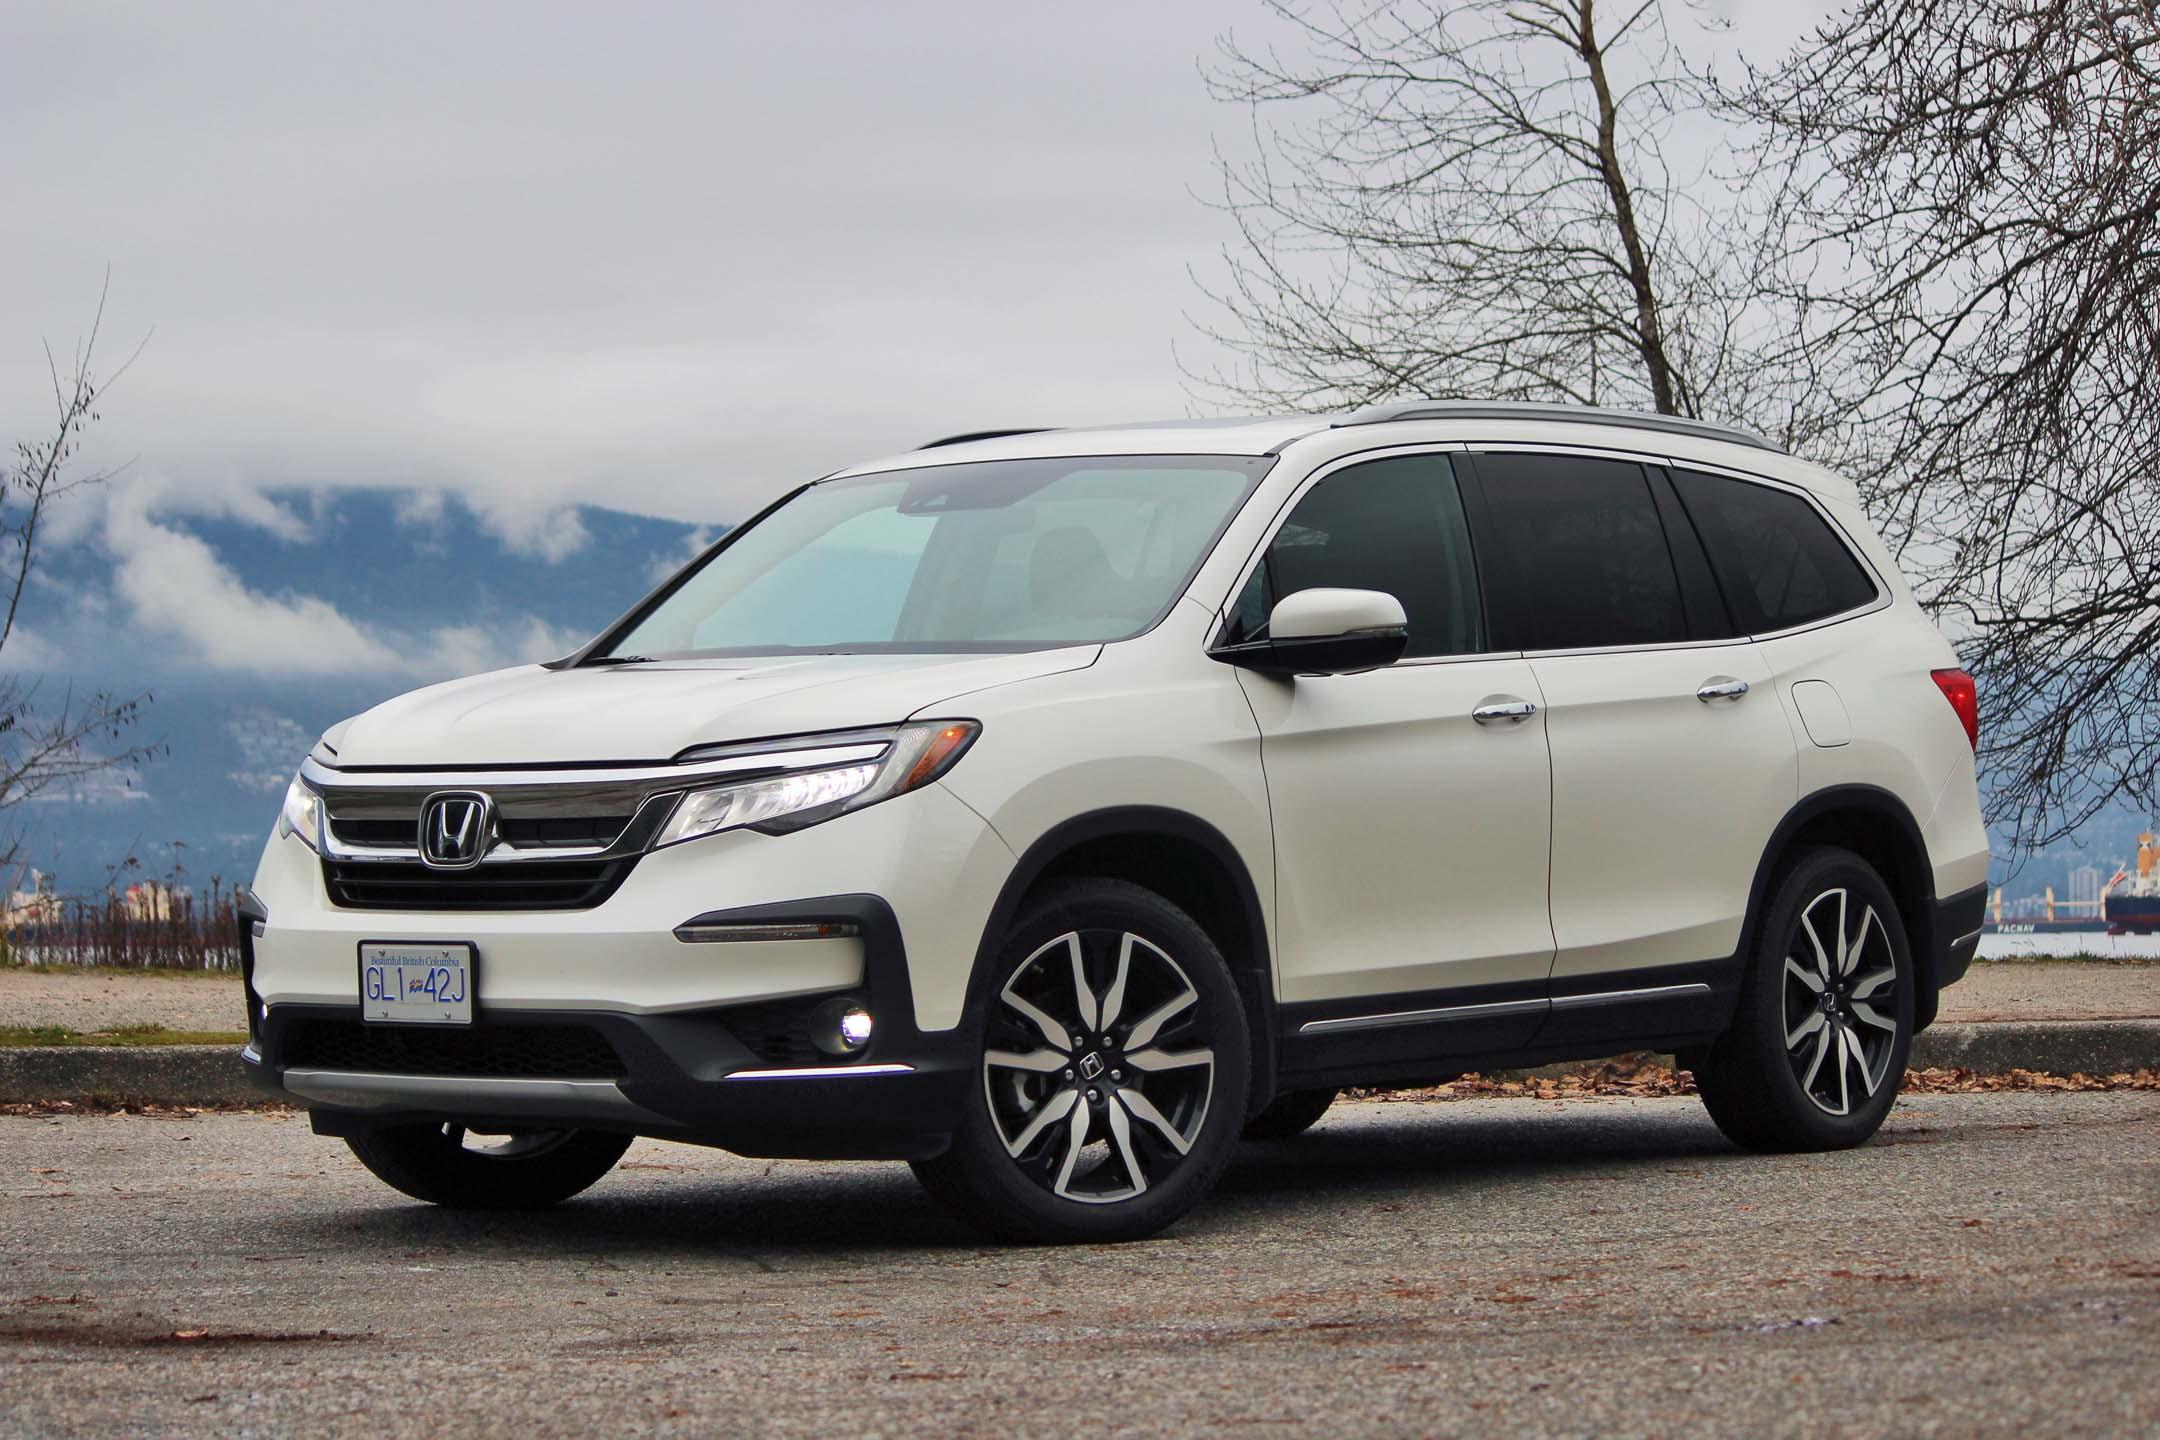 2016 2019 Honda Pilot Used Vehicle Review Expert Reviews Autotrader Ca